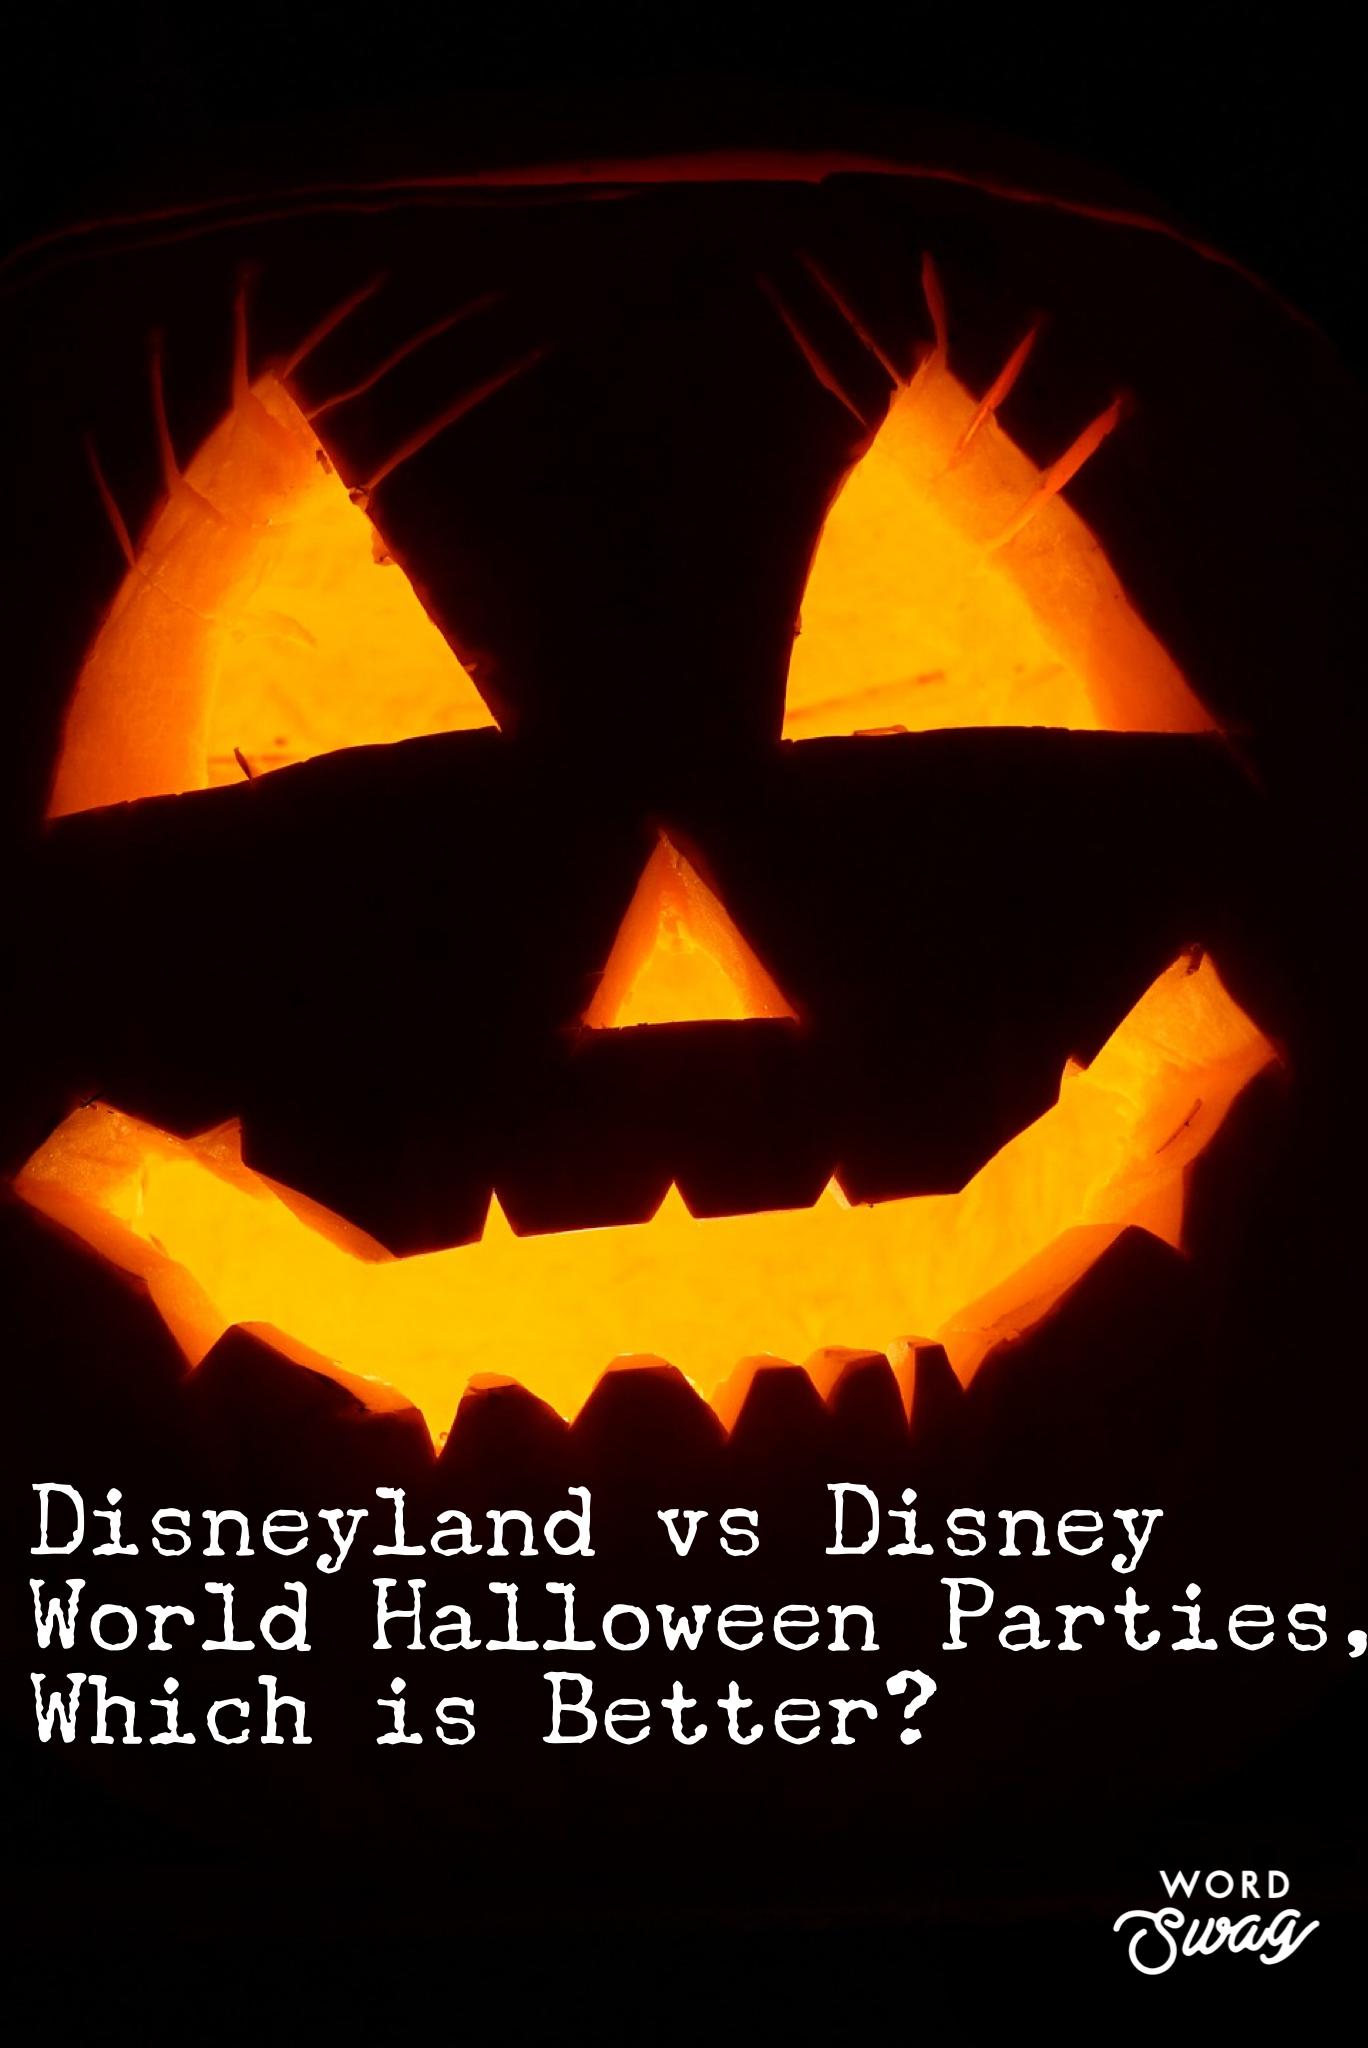 Disneyland vs Disney World Halloween party! What are the